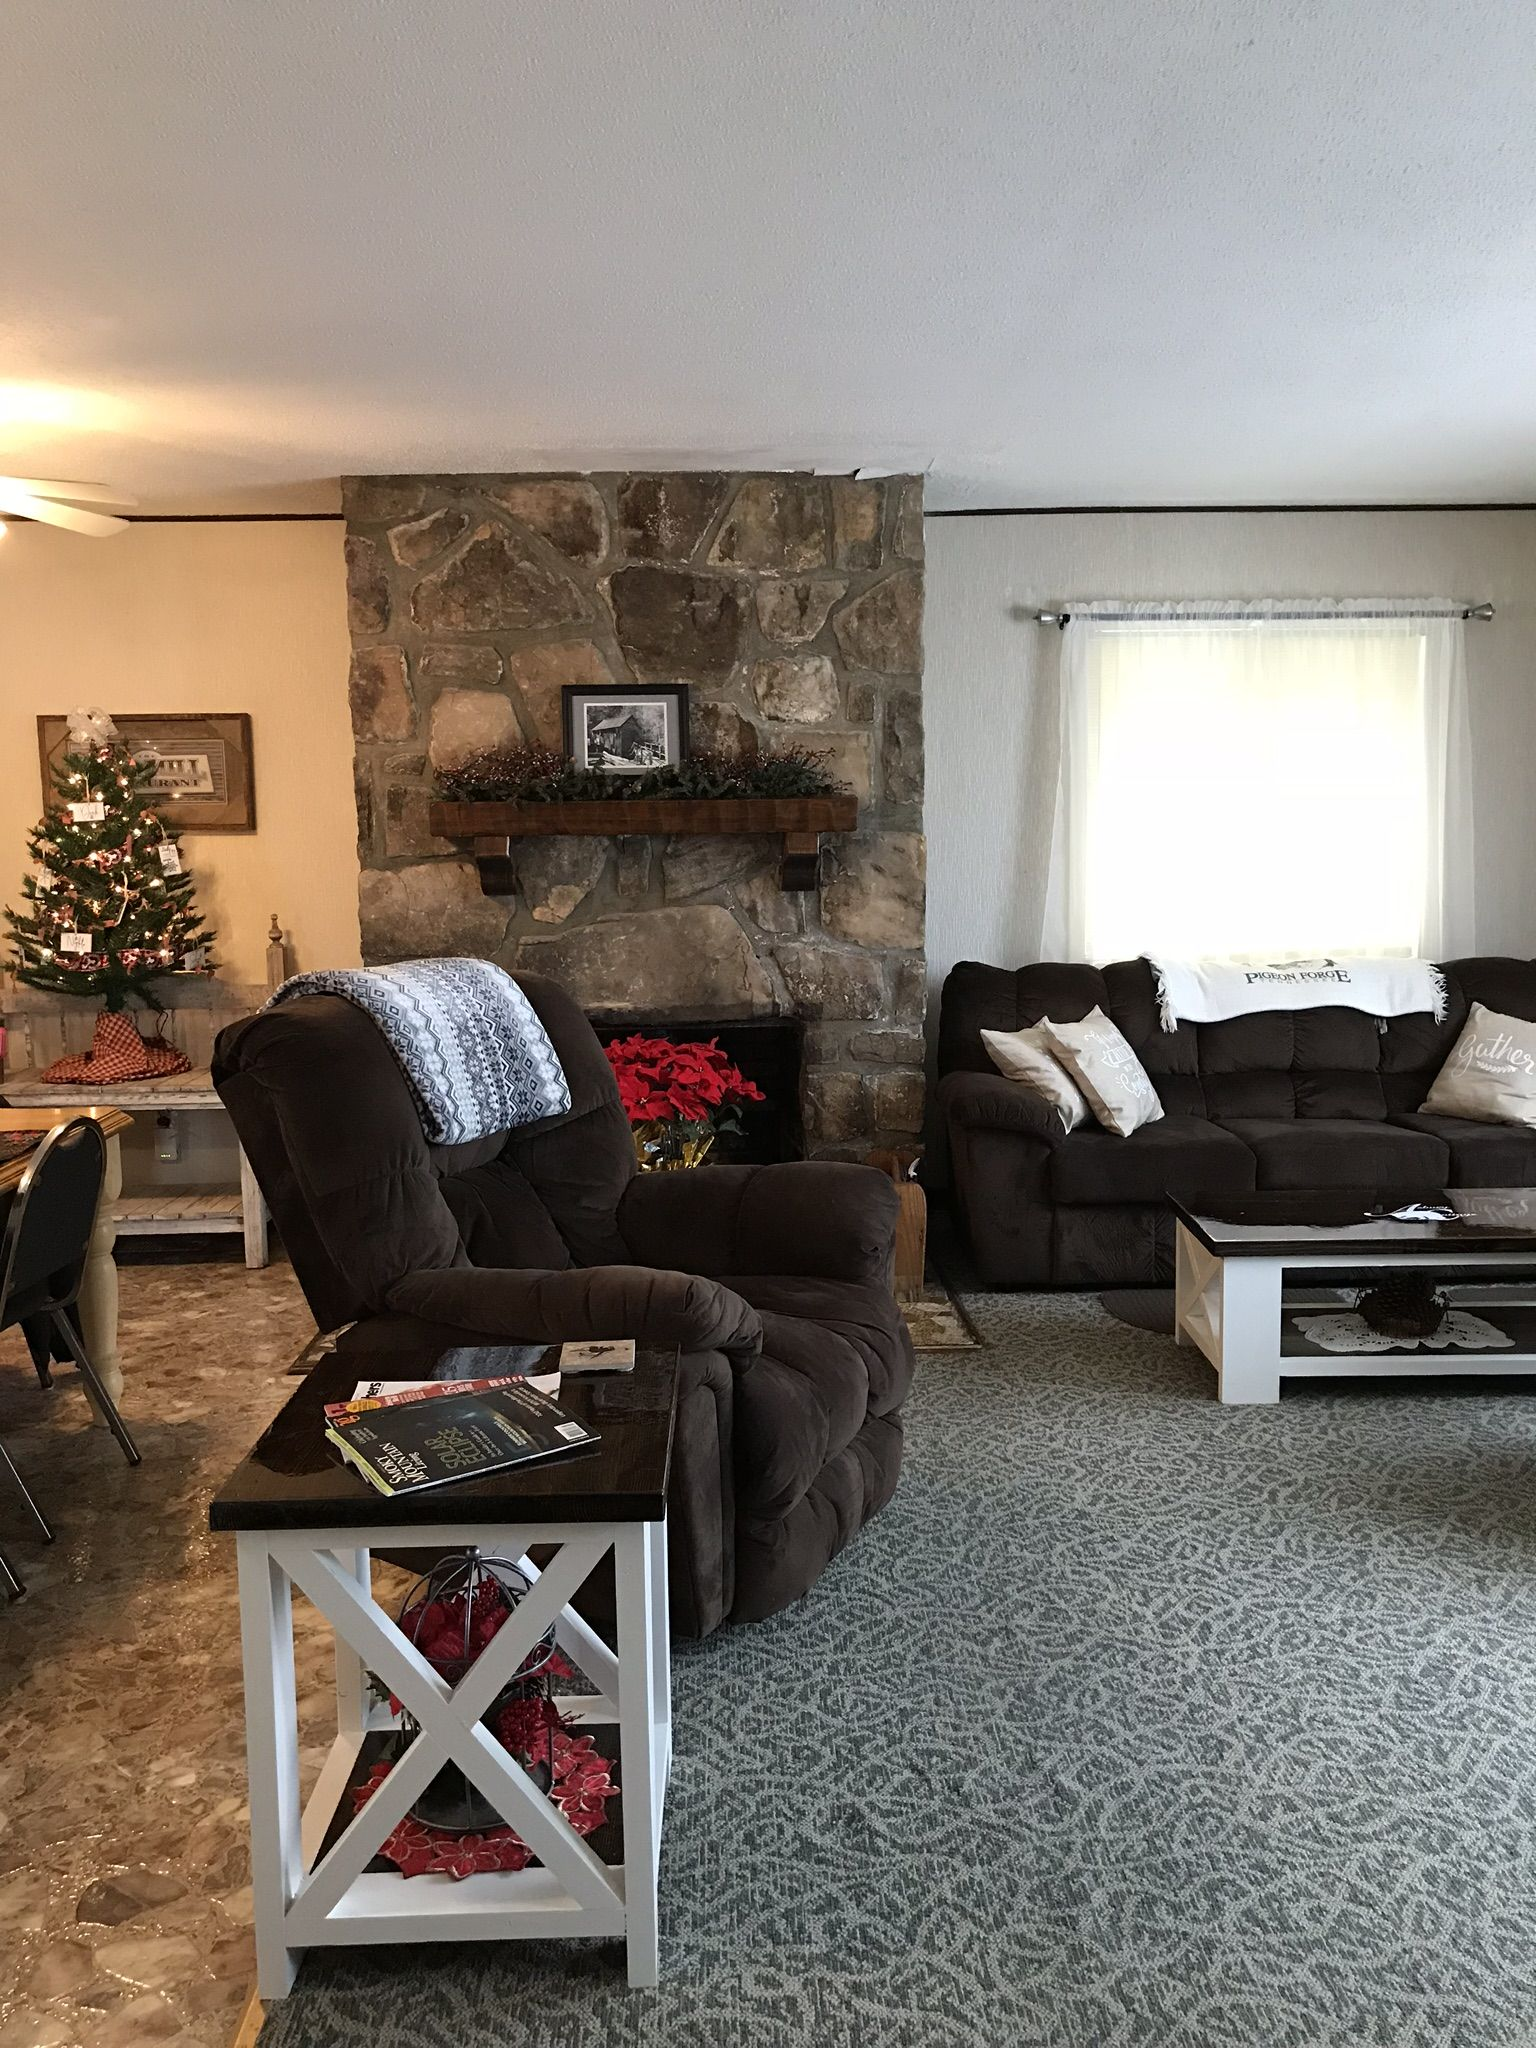 Asbury Cottage 2 Vacation Rental 3 Bedrooms 2 Baths